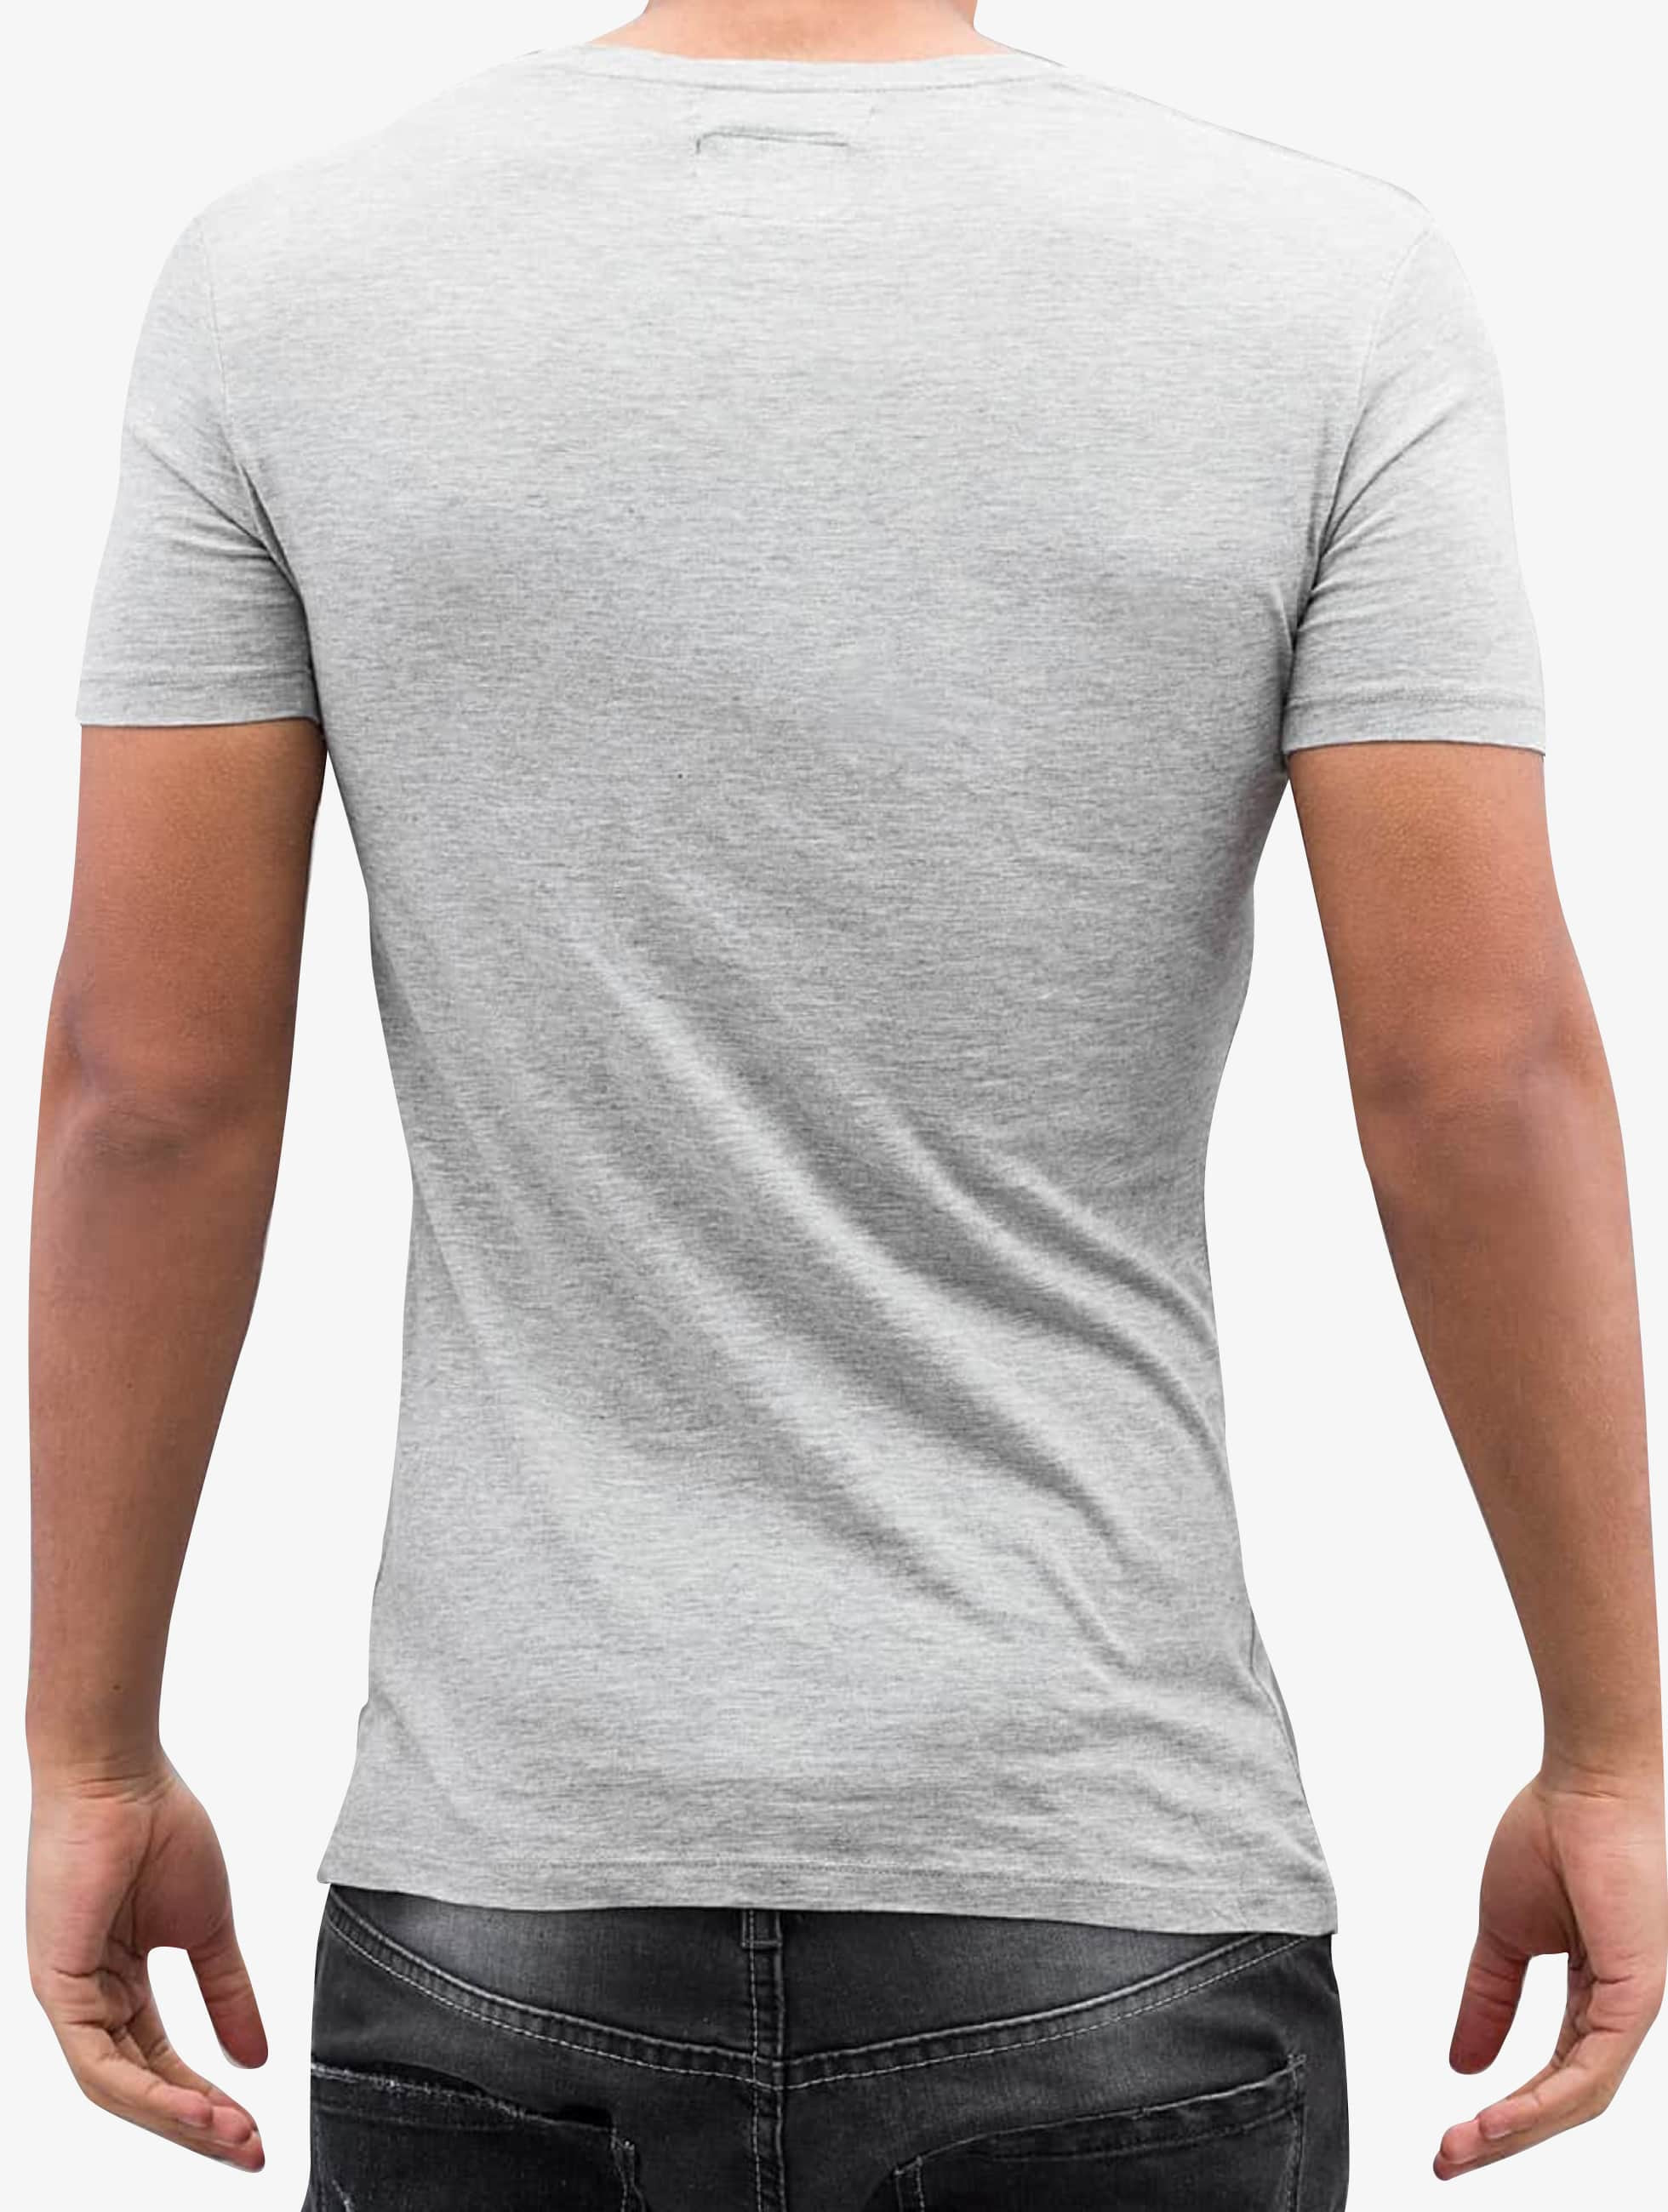 Amsterdenim T-Shirt Aad grey